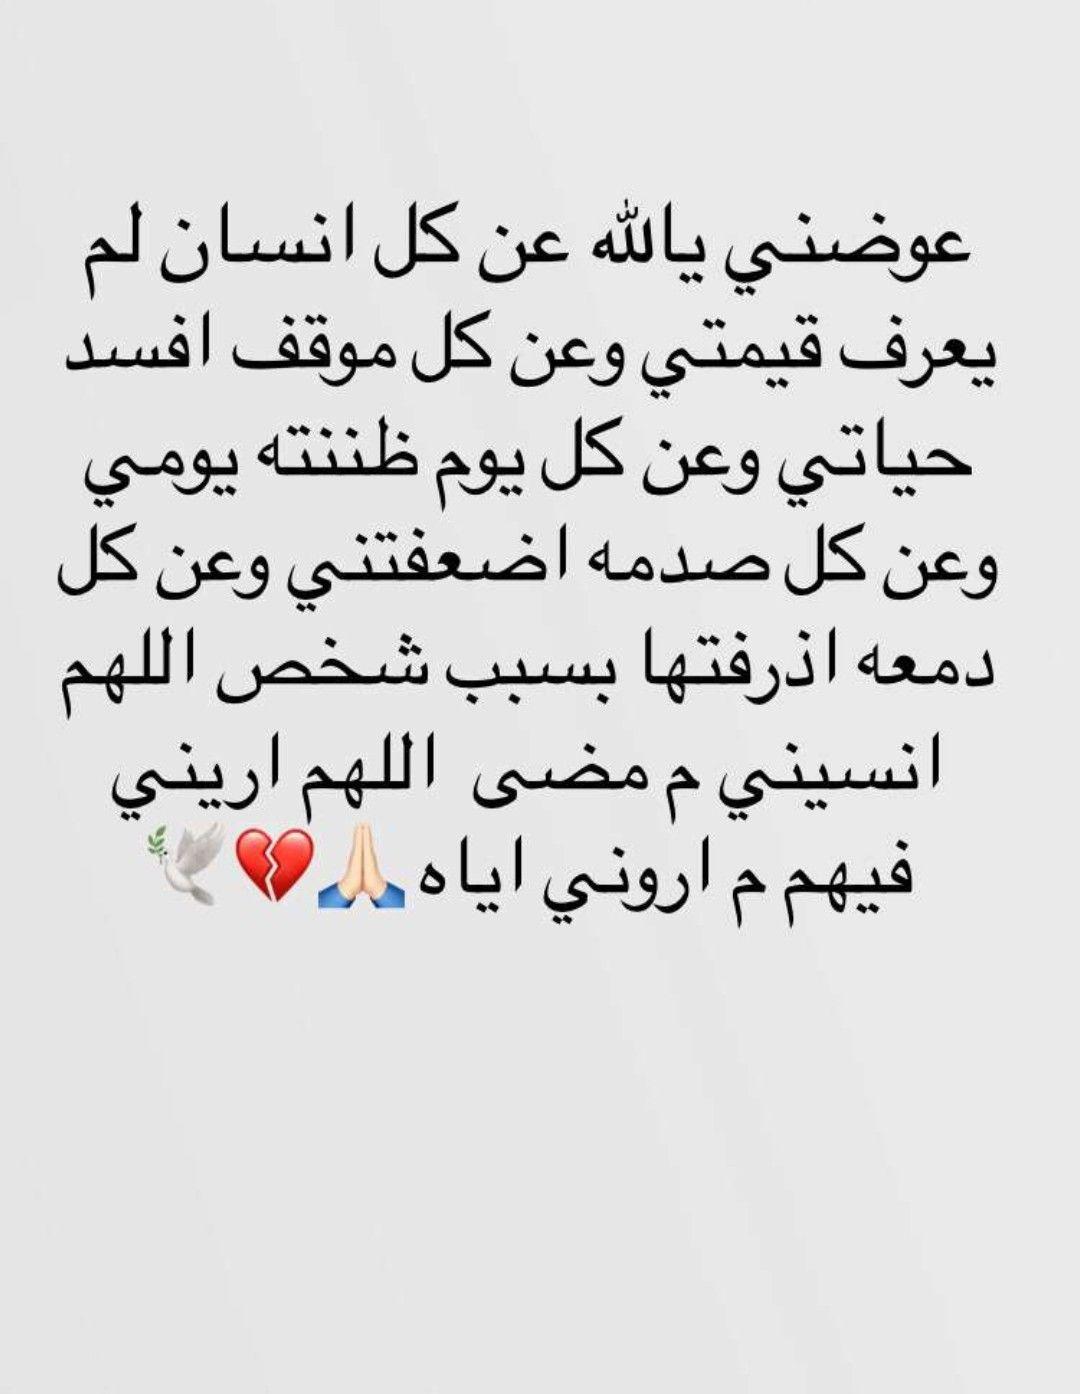 Pin By Sara On Allah Qoutes Allah Arabic Calligraphy